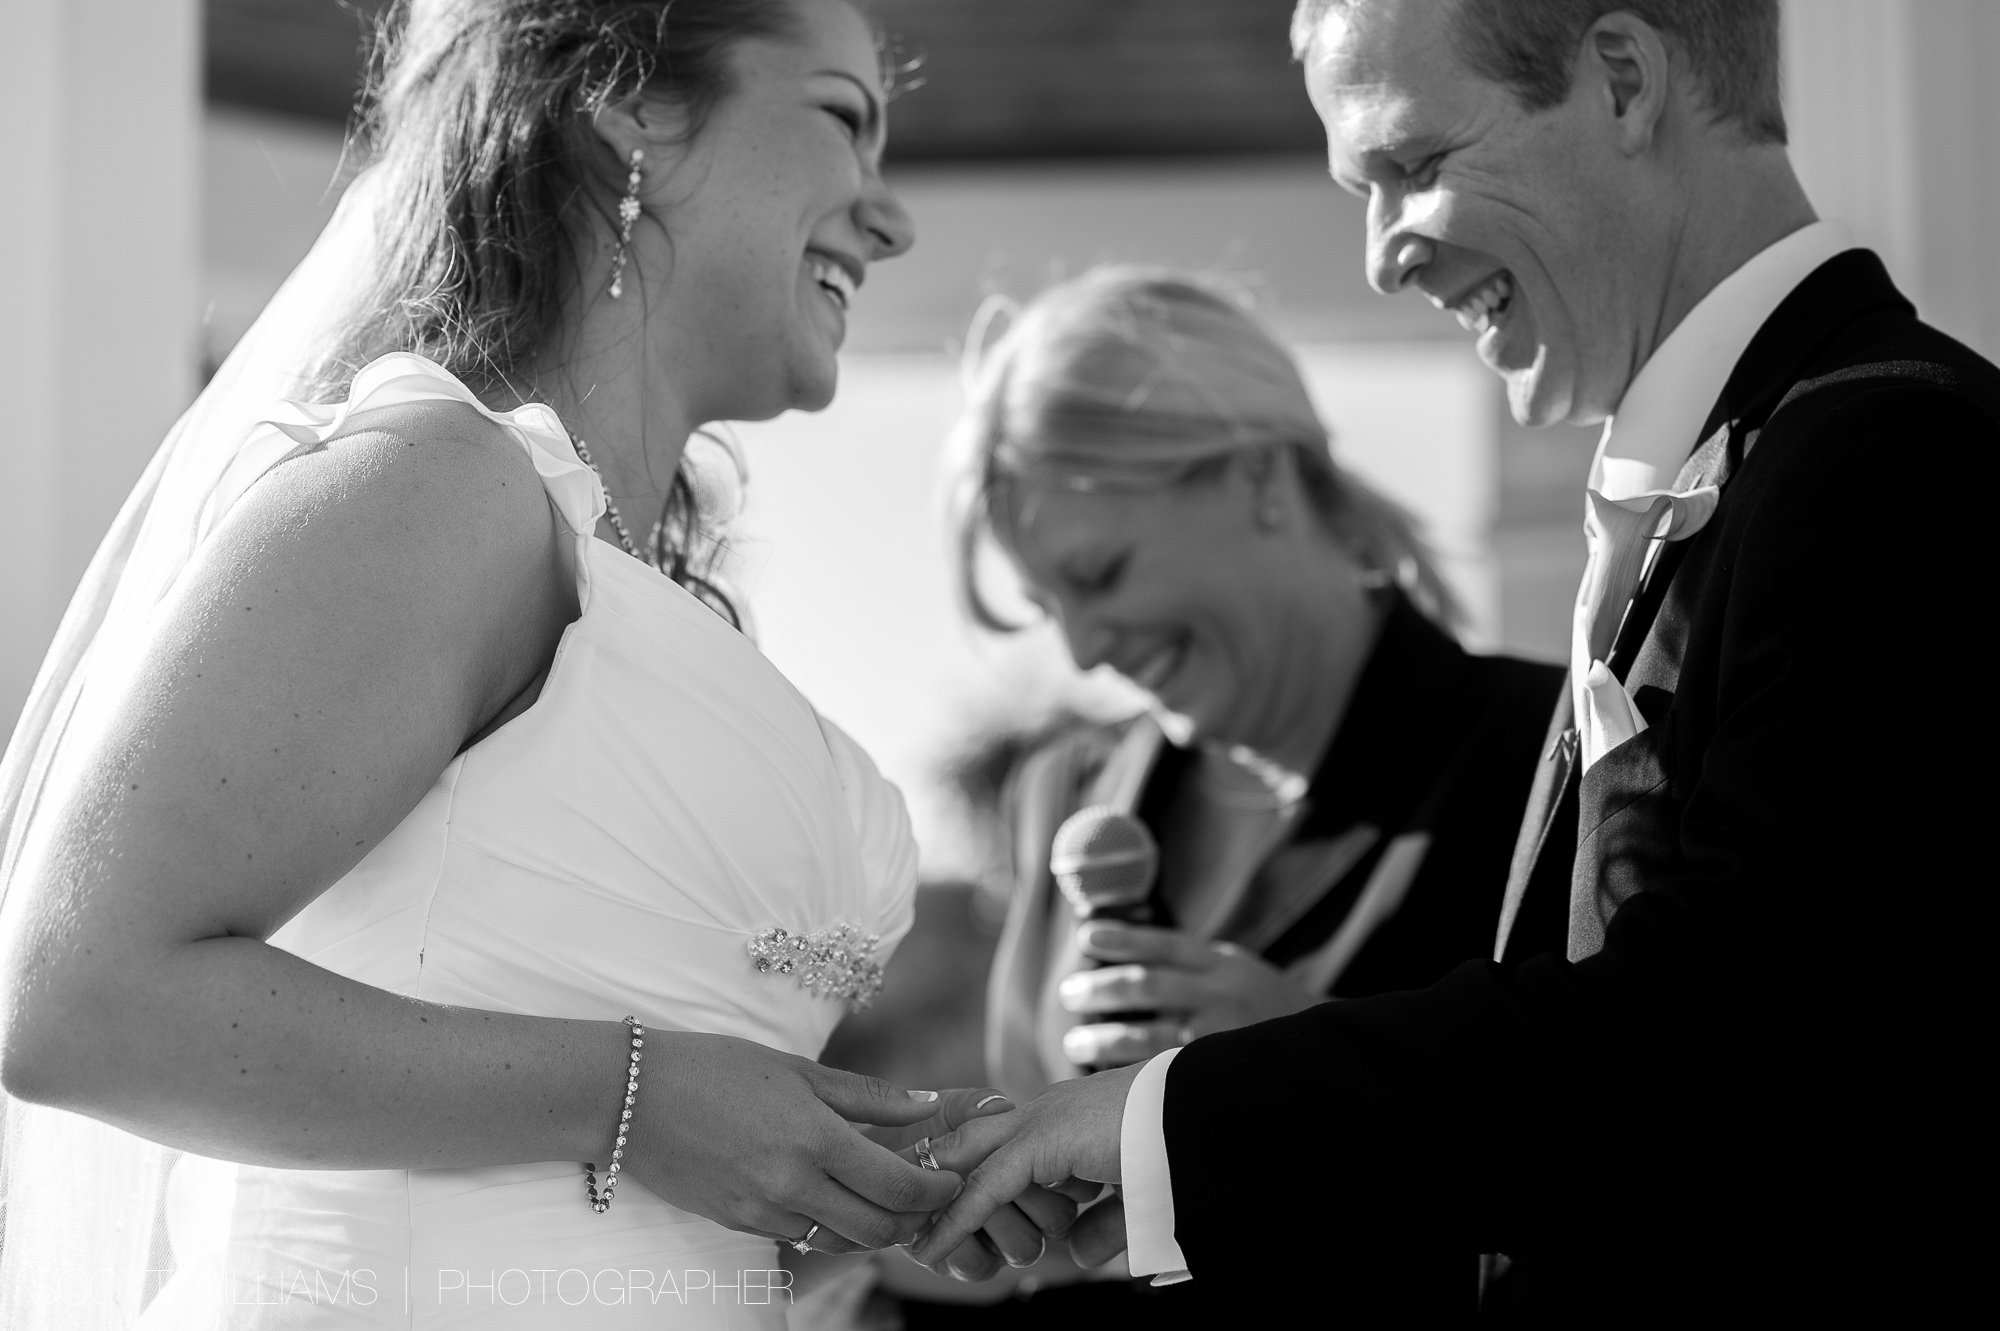 whistle-bear-wedding-photography-006.jpg